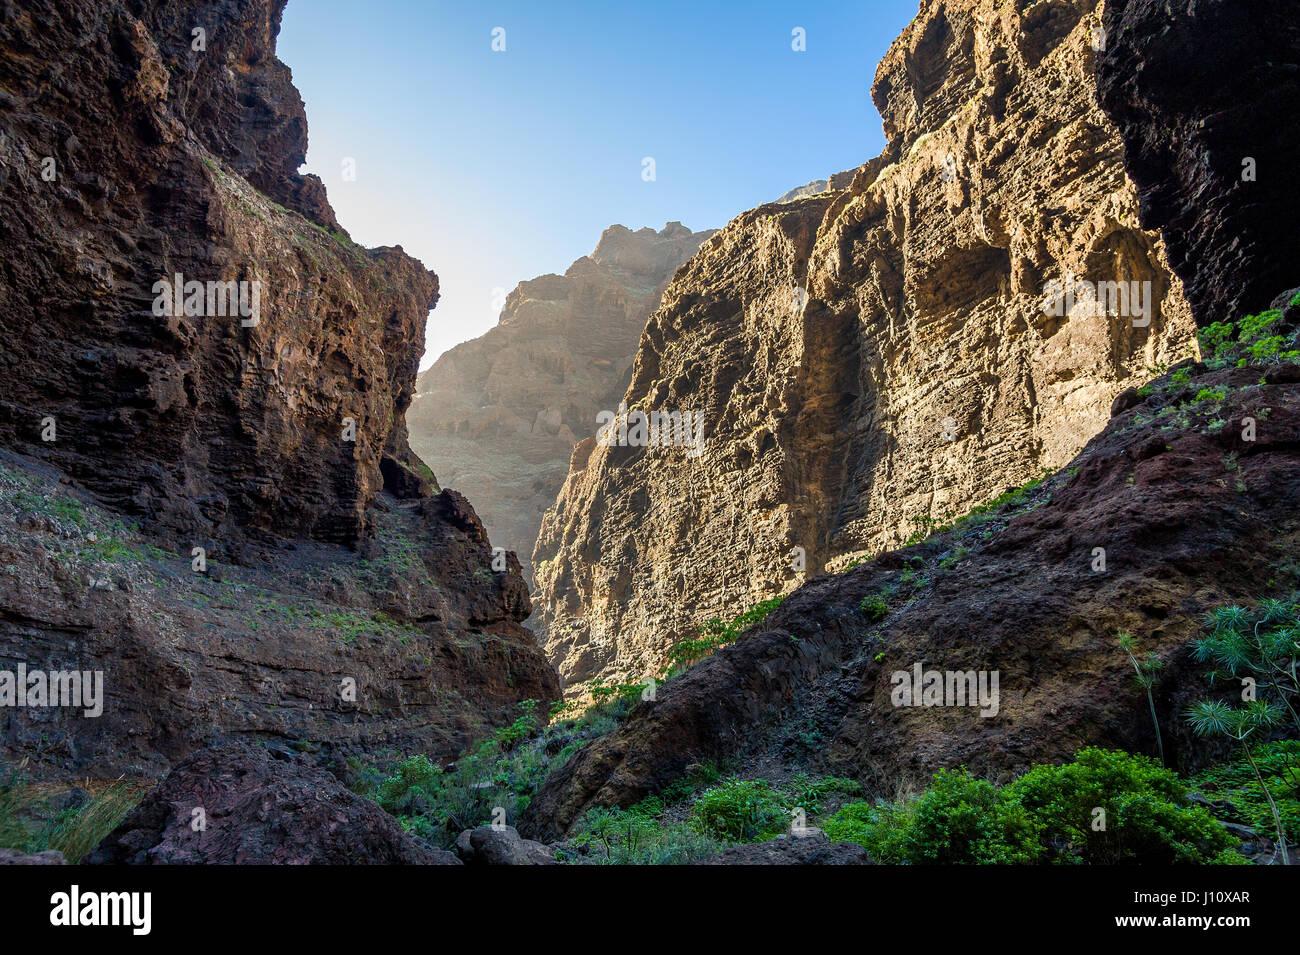 Evening at Masca rocks, Tenerife - Stock Image